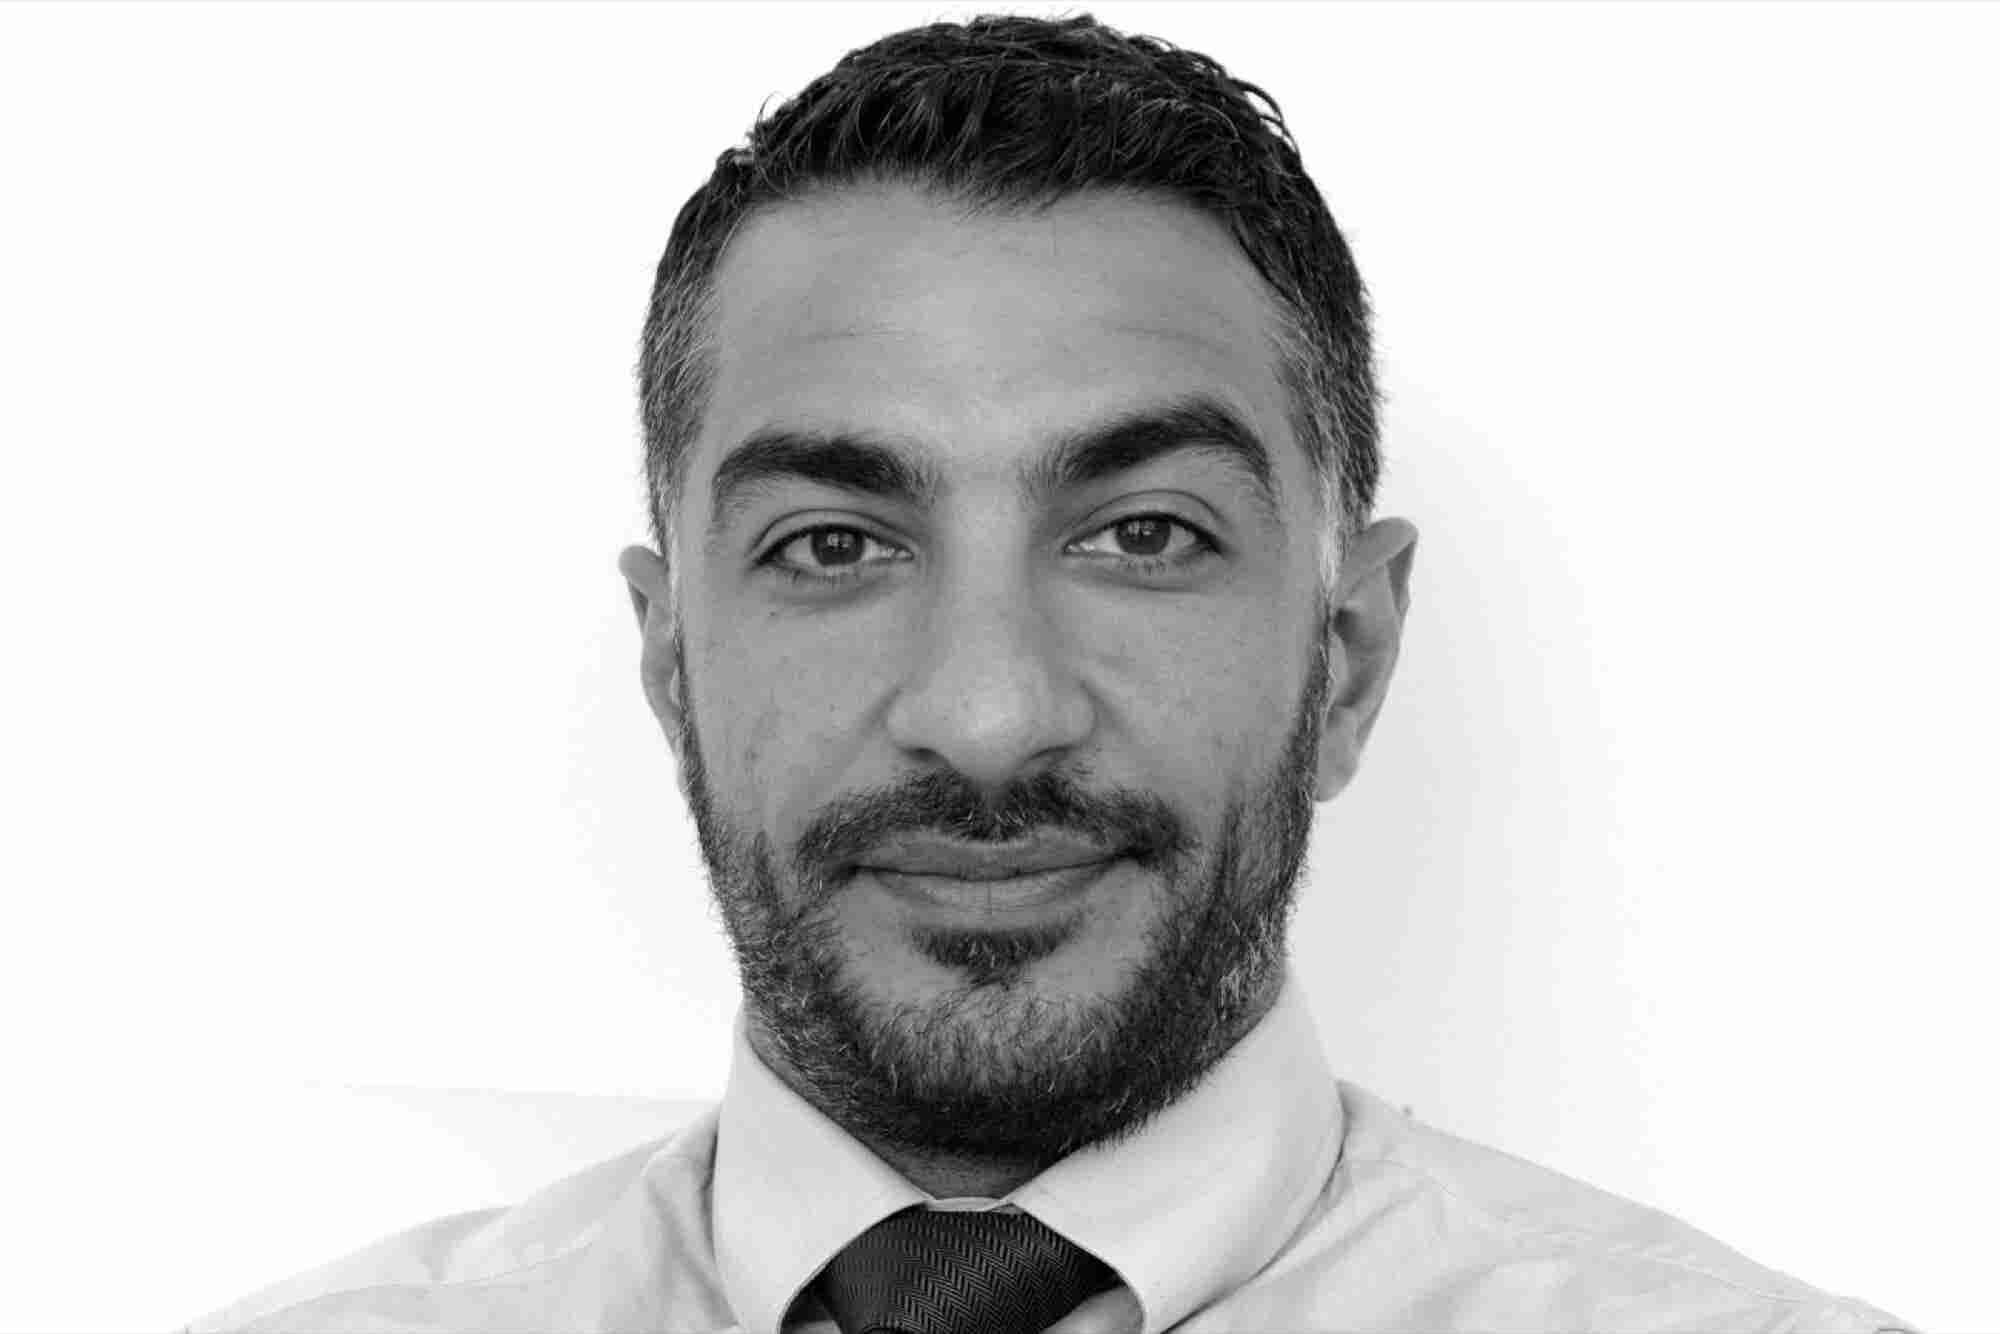 Off The Beaten Path: Kamal Al-Samarrai, Founder And CEO, Dawaami